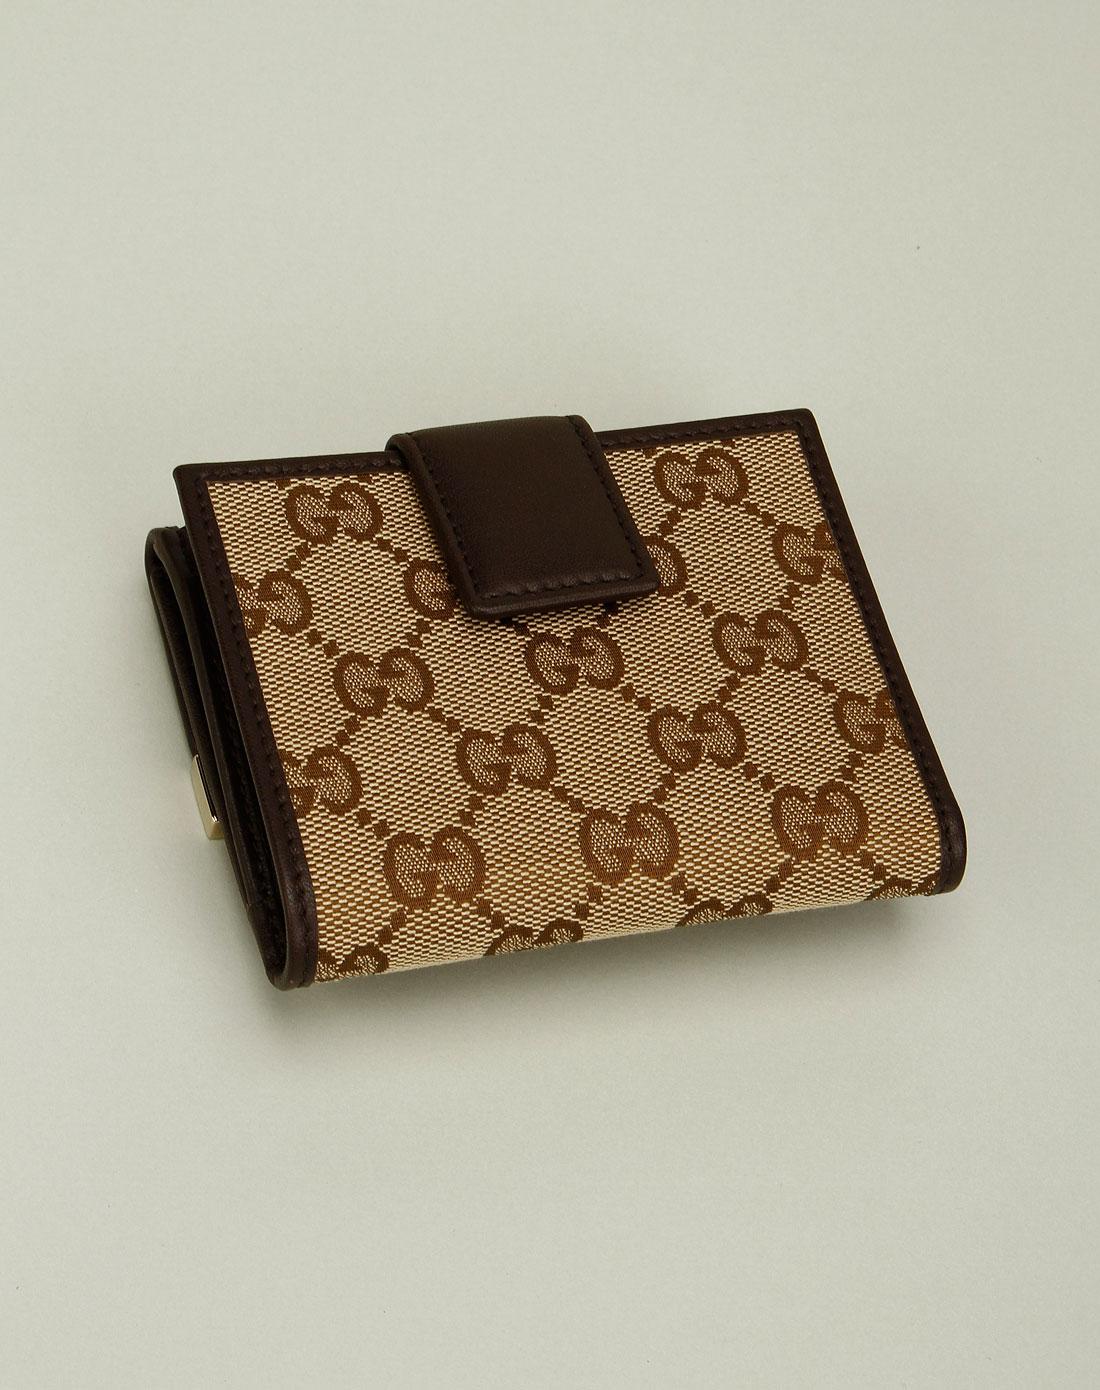 gucci钱包专场女款浅棕色双g印花素雅钱包257016fafx